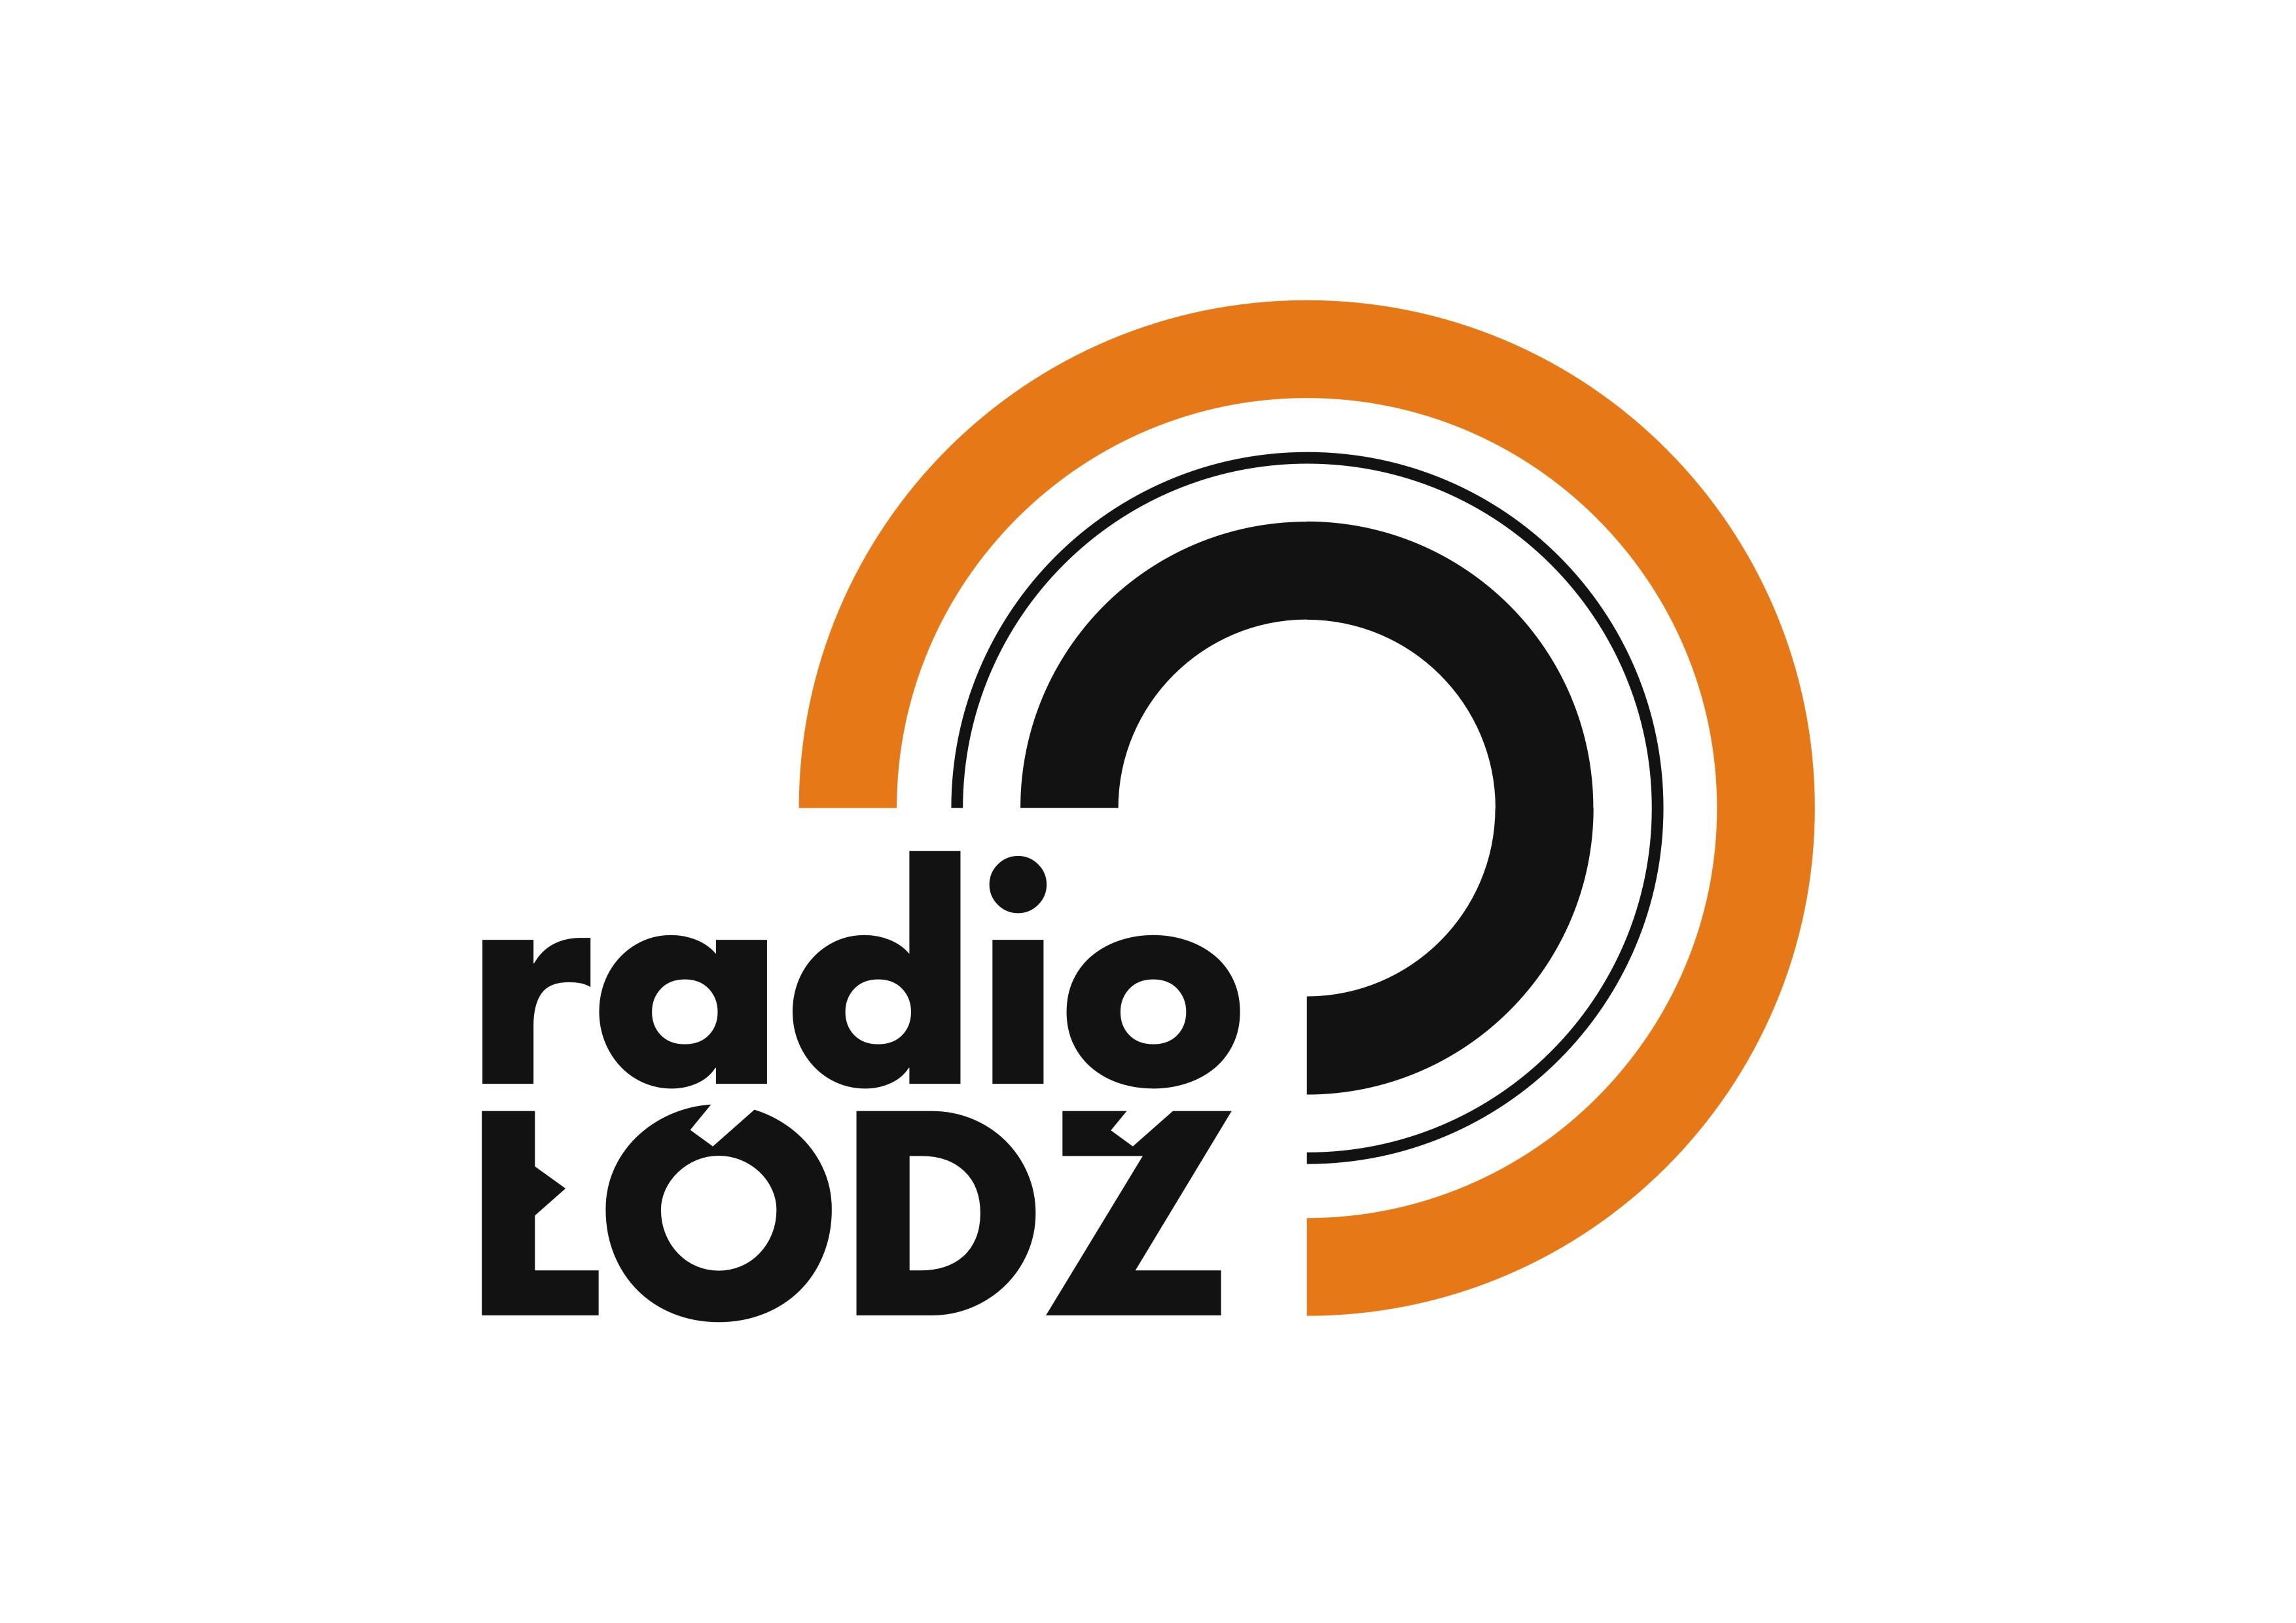 radiolodz.jpg